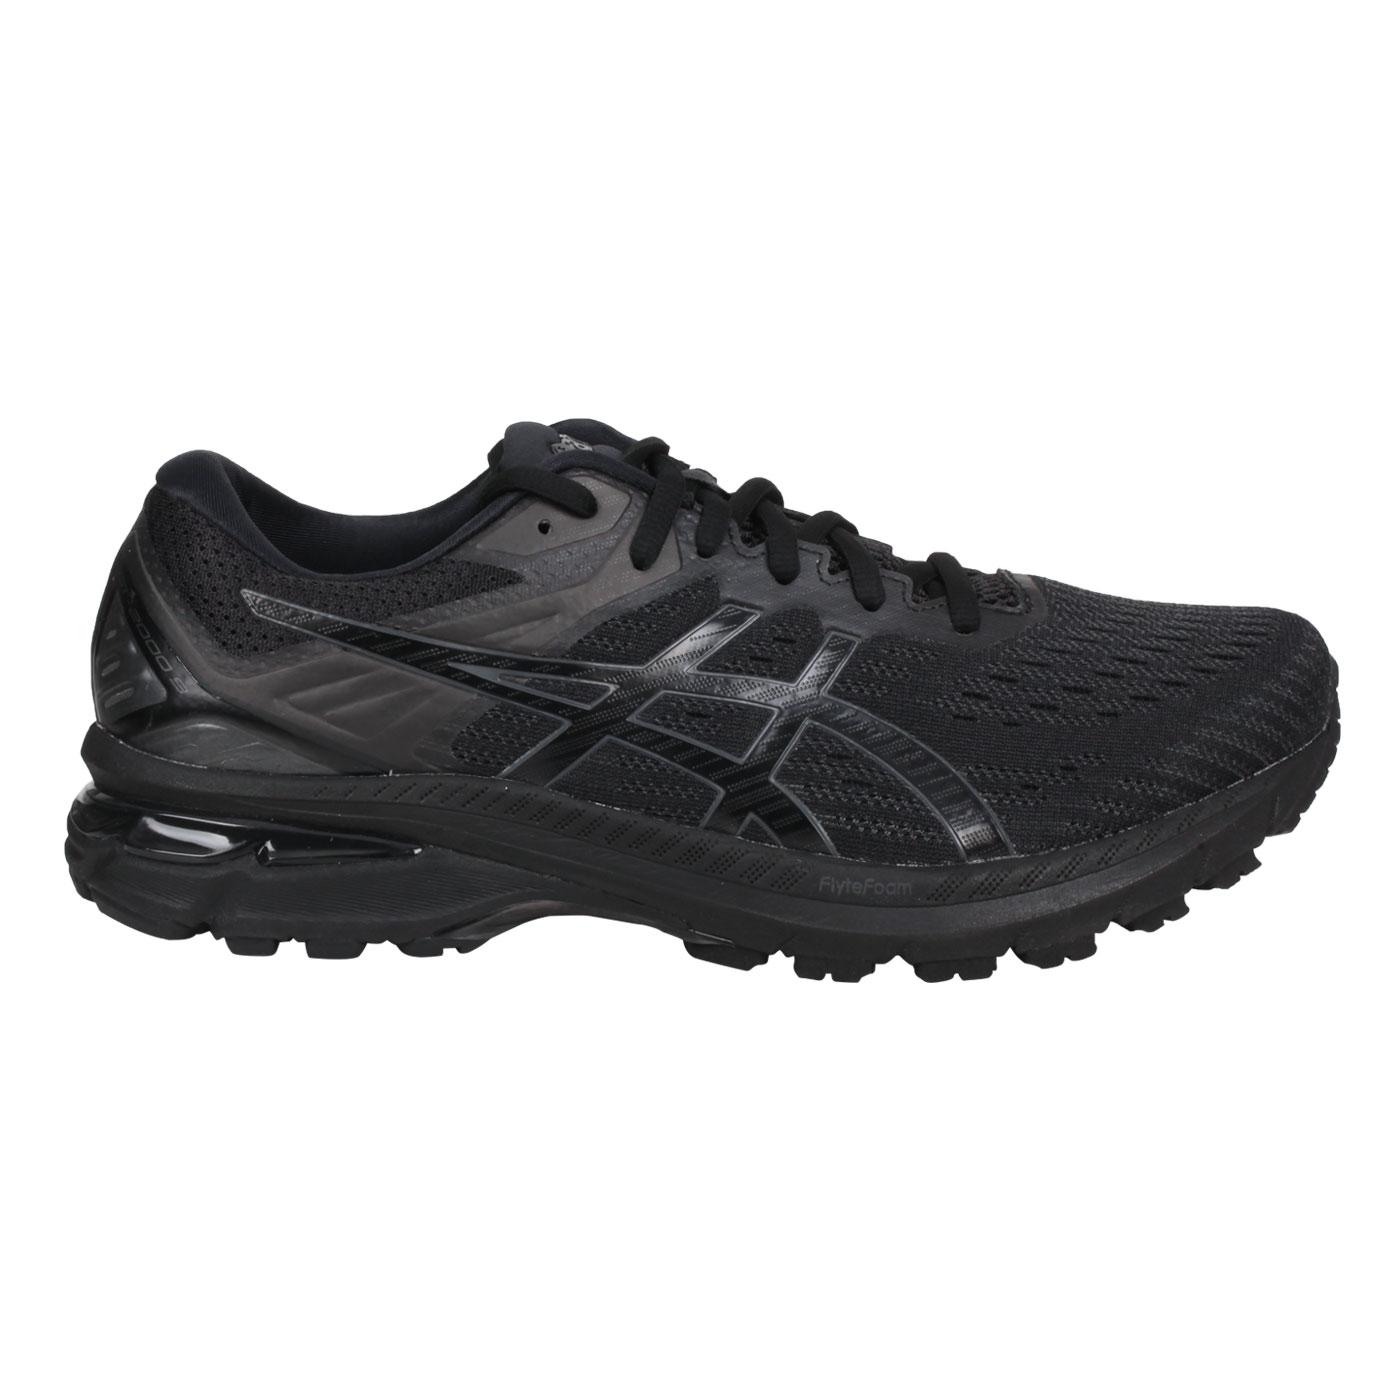 ASICS 男款慢跑鞋-4E  @GT-2000 9@1011A987-002